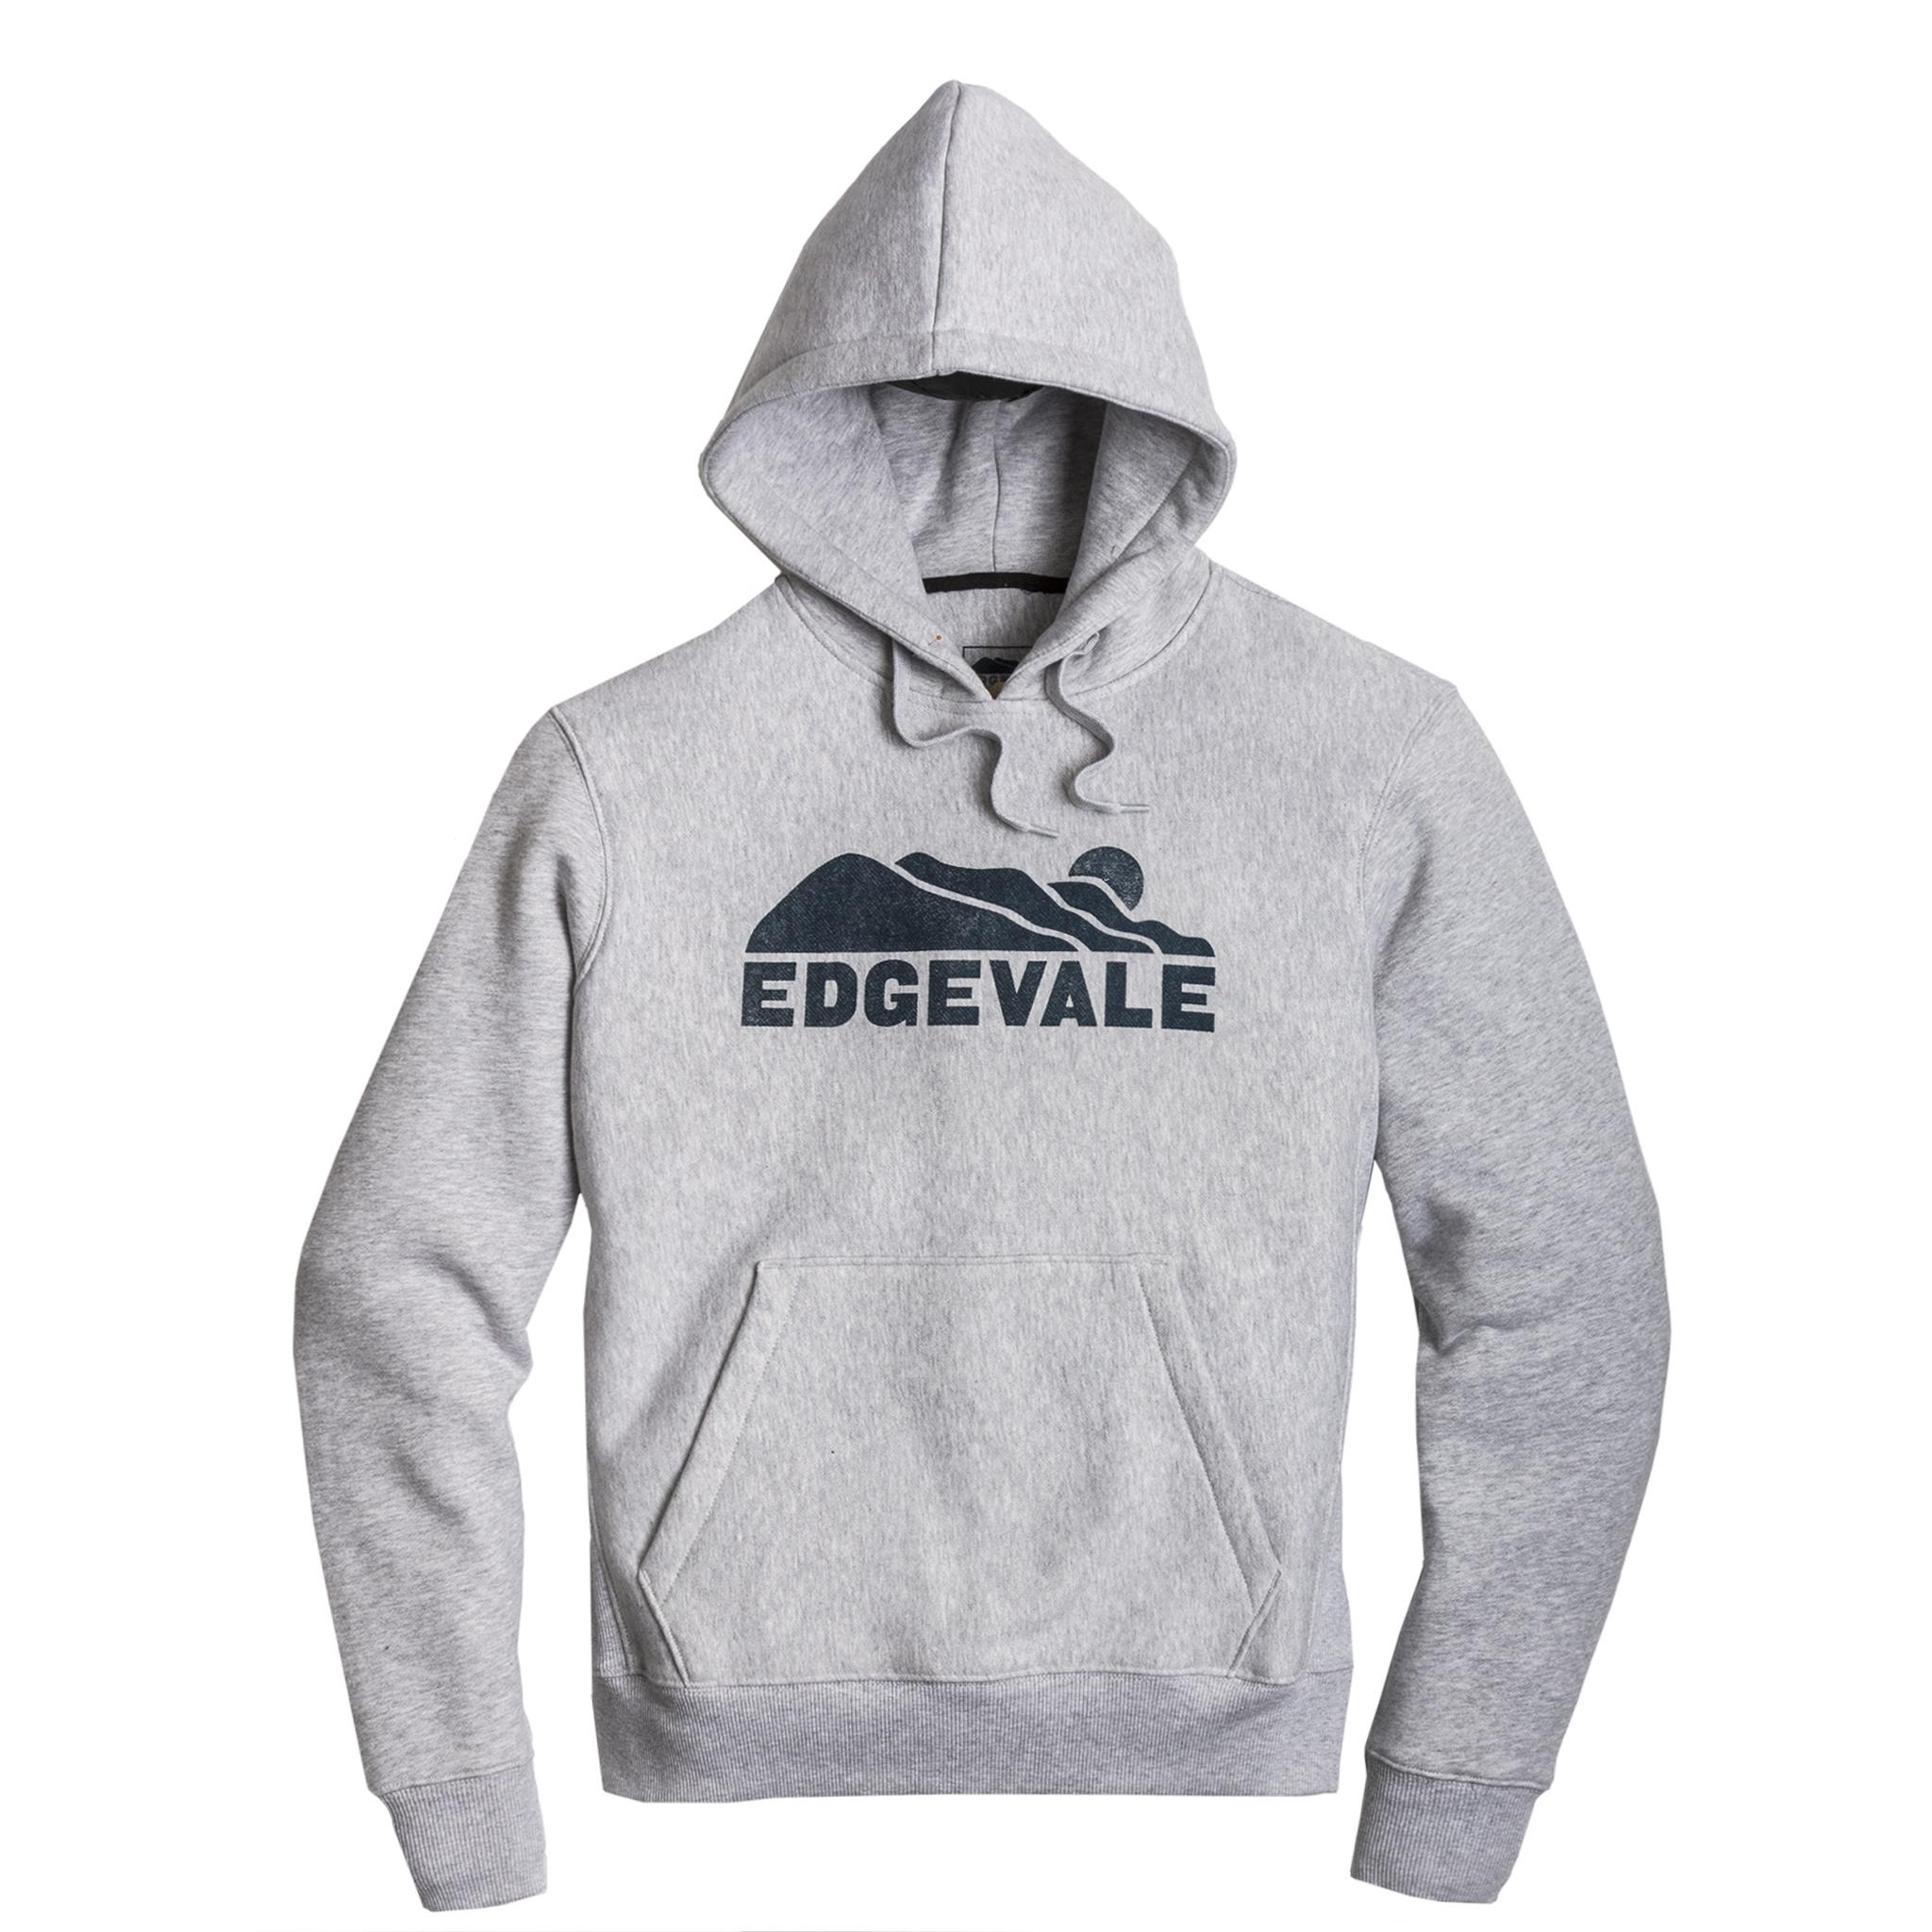 Edgevale, 2019